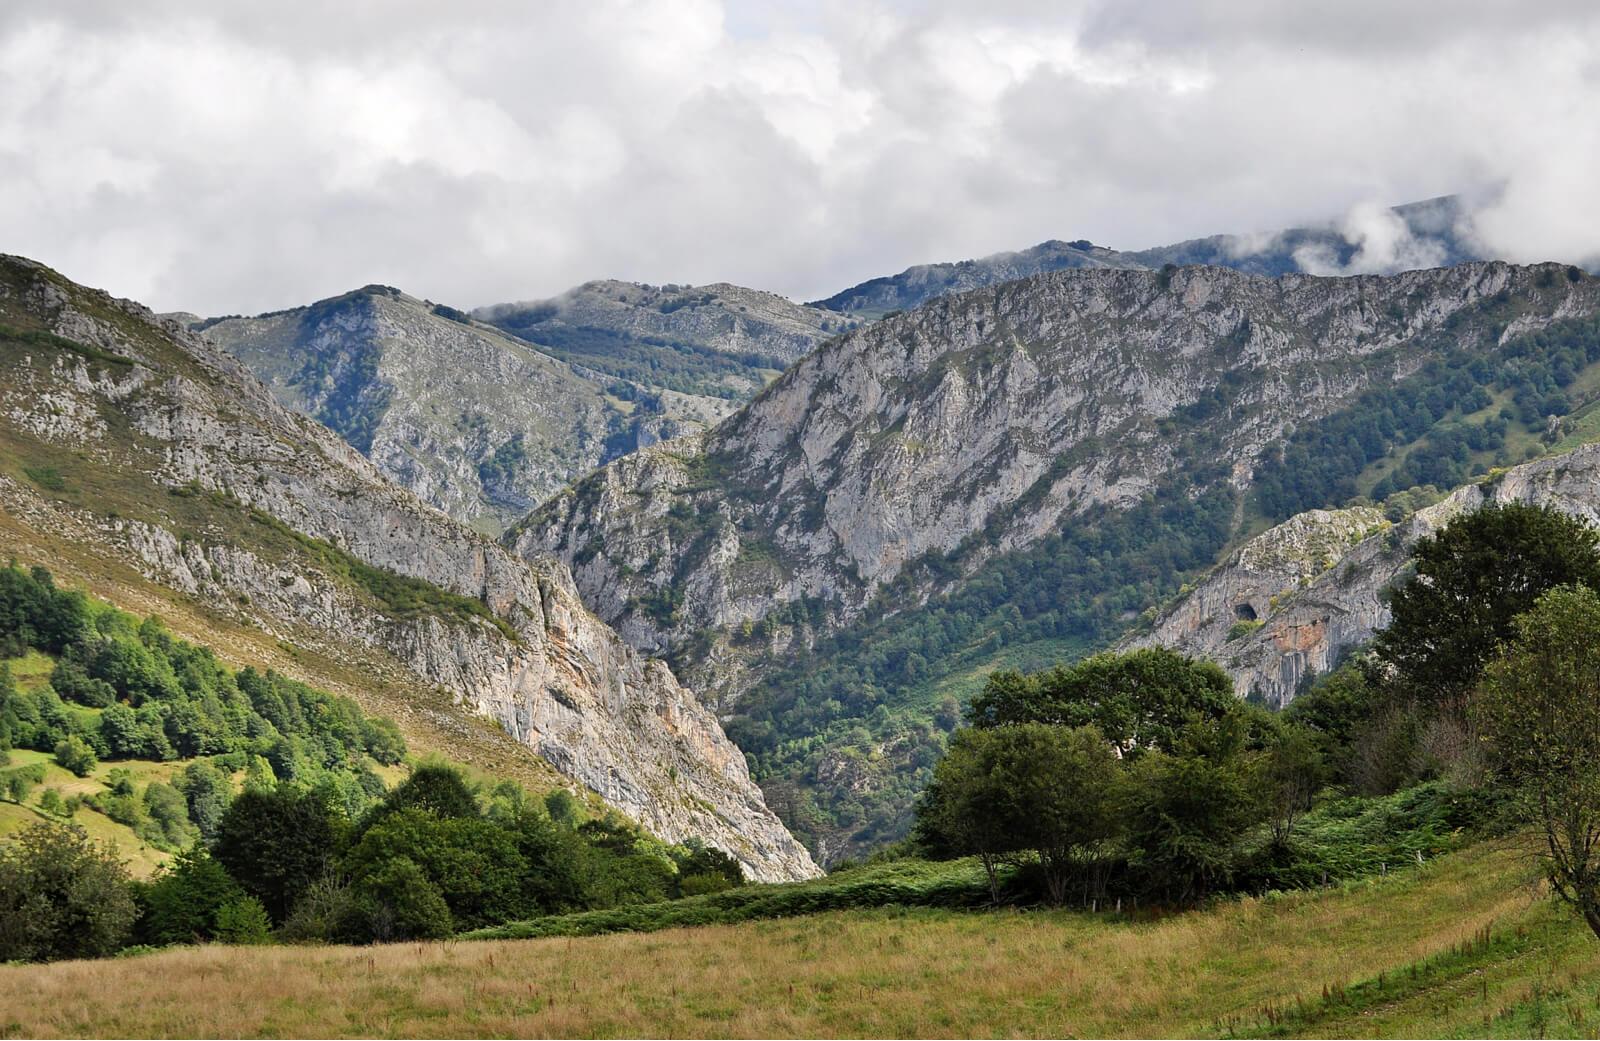 Parque Natural Ponga lugares para desconectar en Asturias